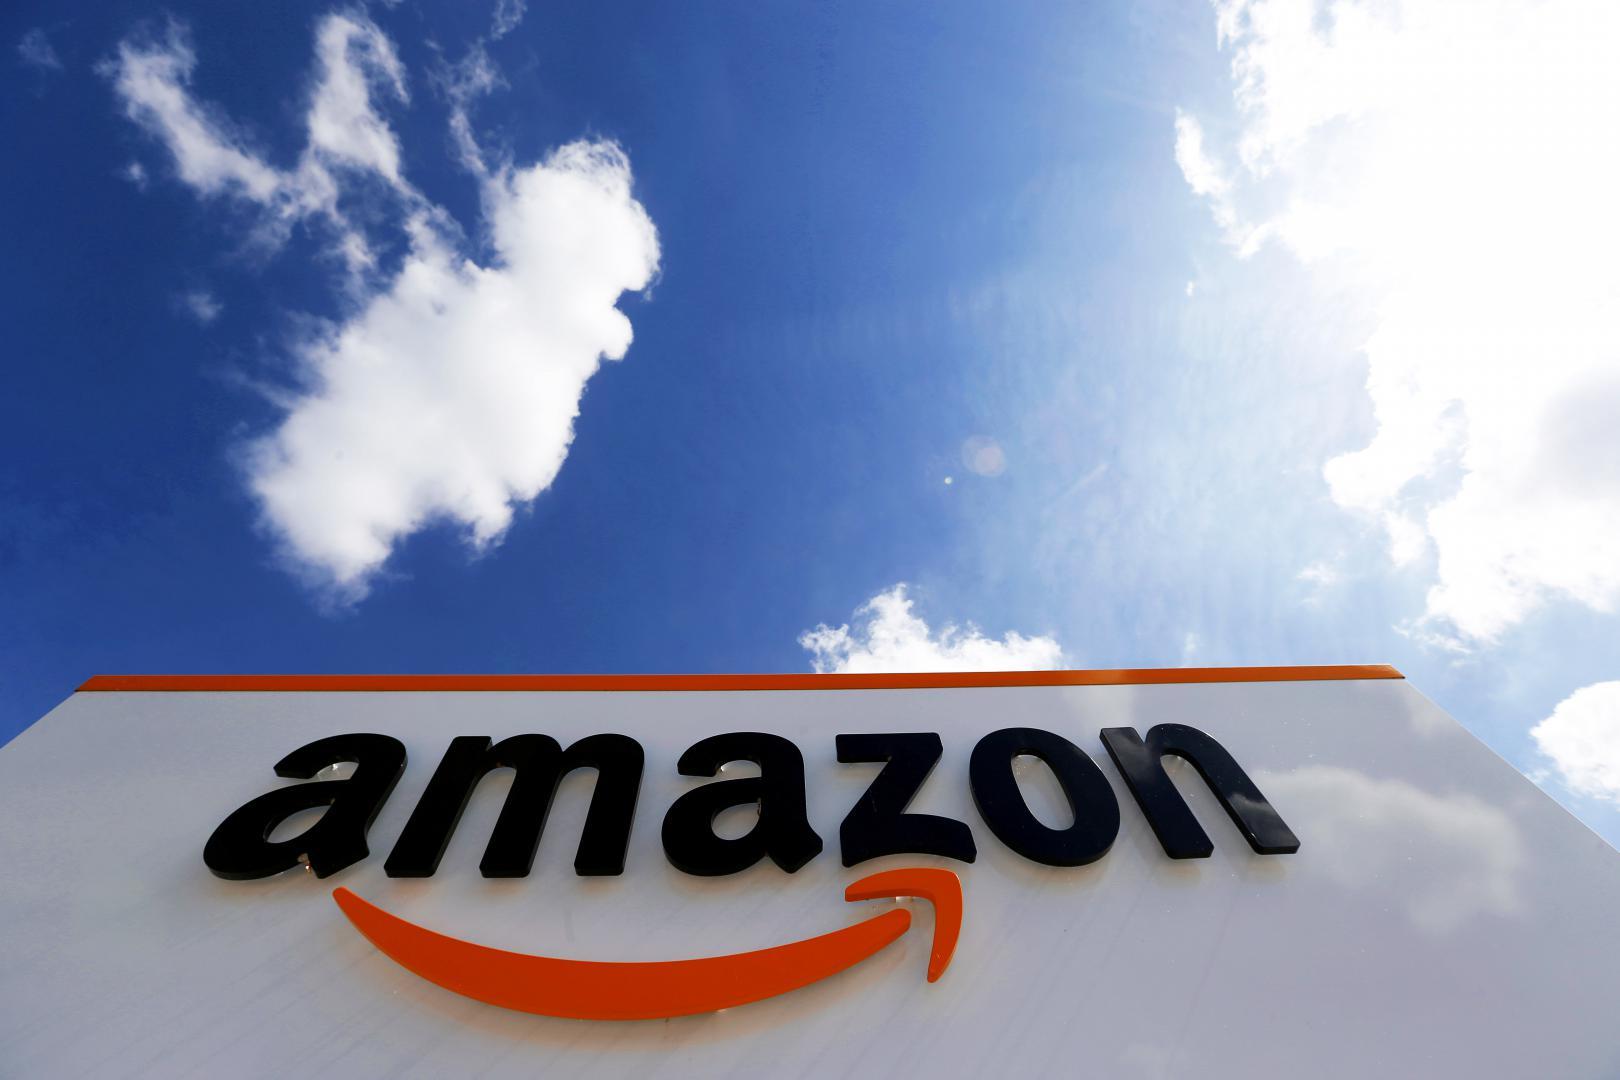 Amazon logo, Амазон лого, обои на смартфон логотипы, 5184 на 3456 пикселей